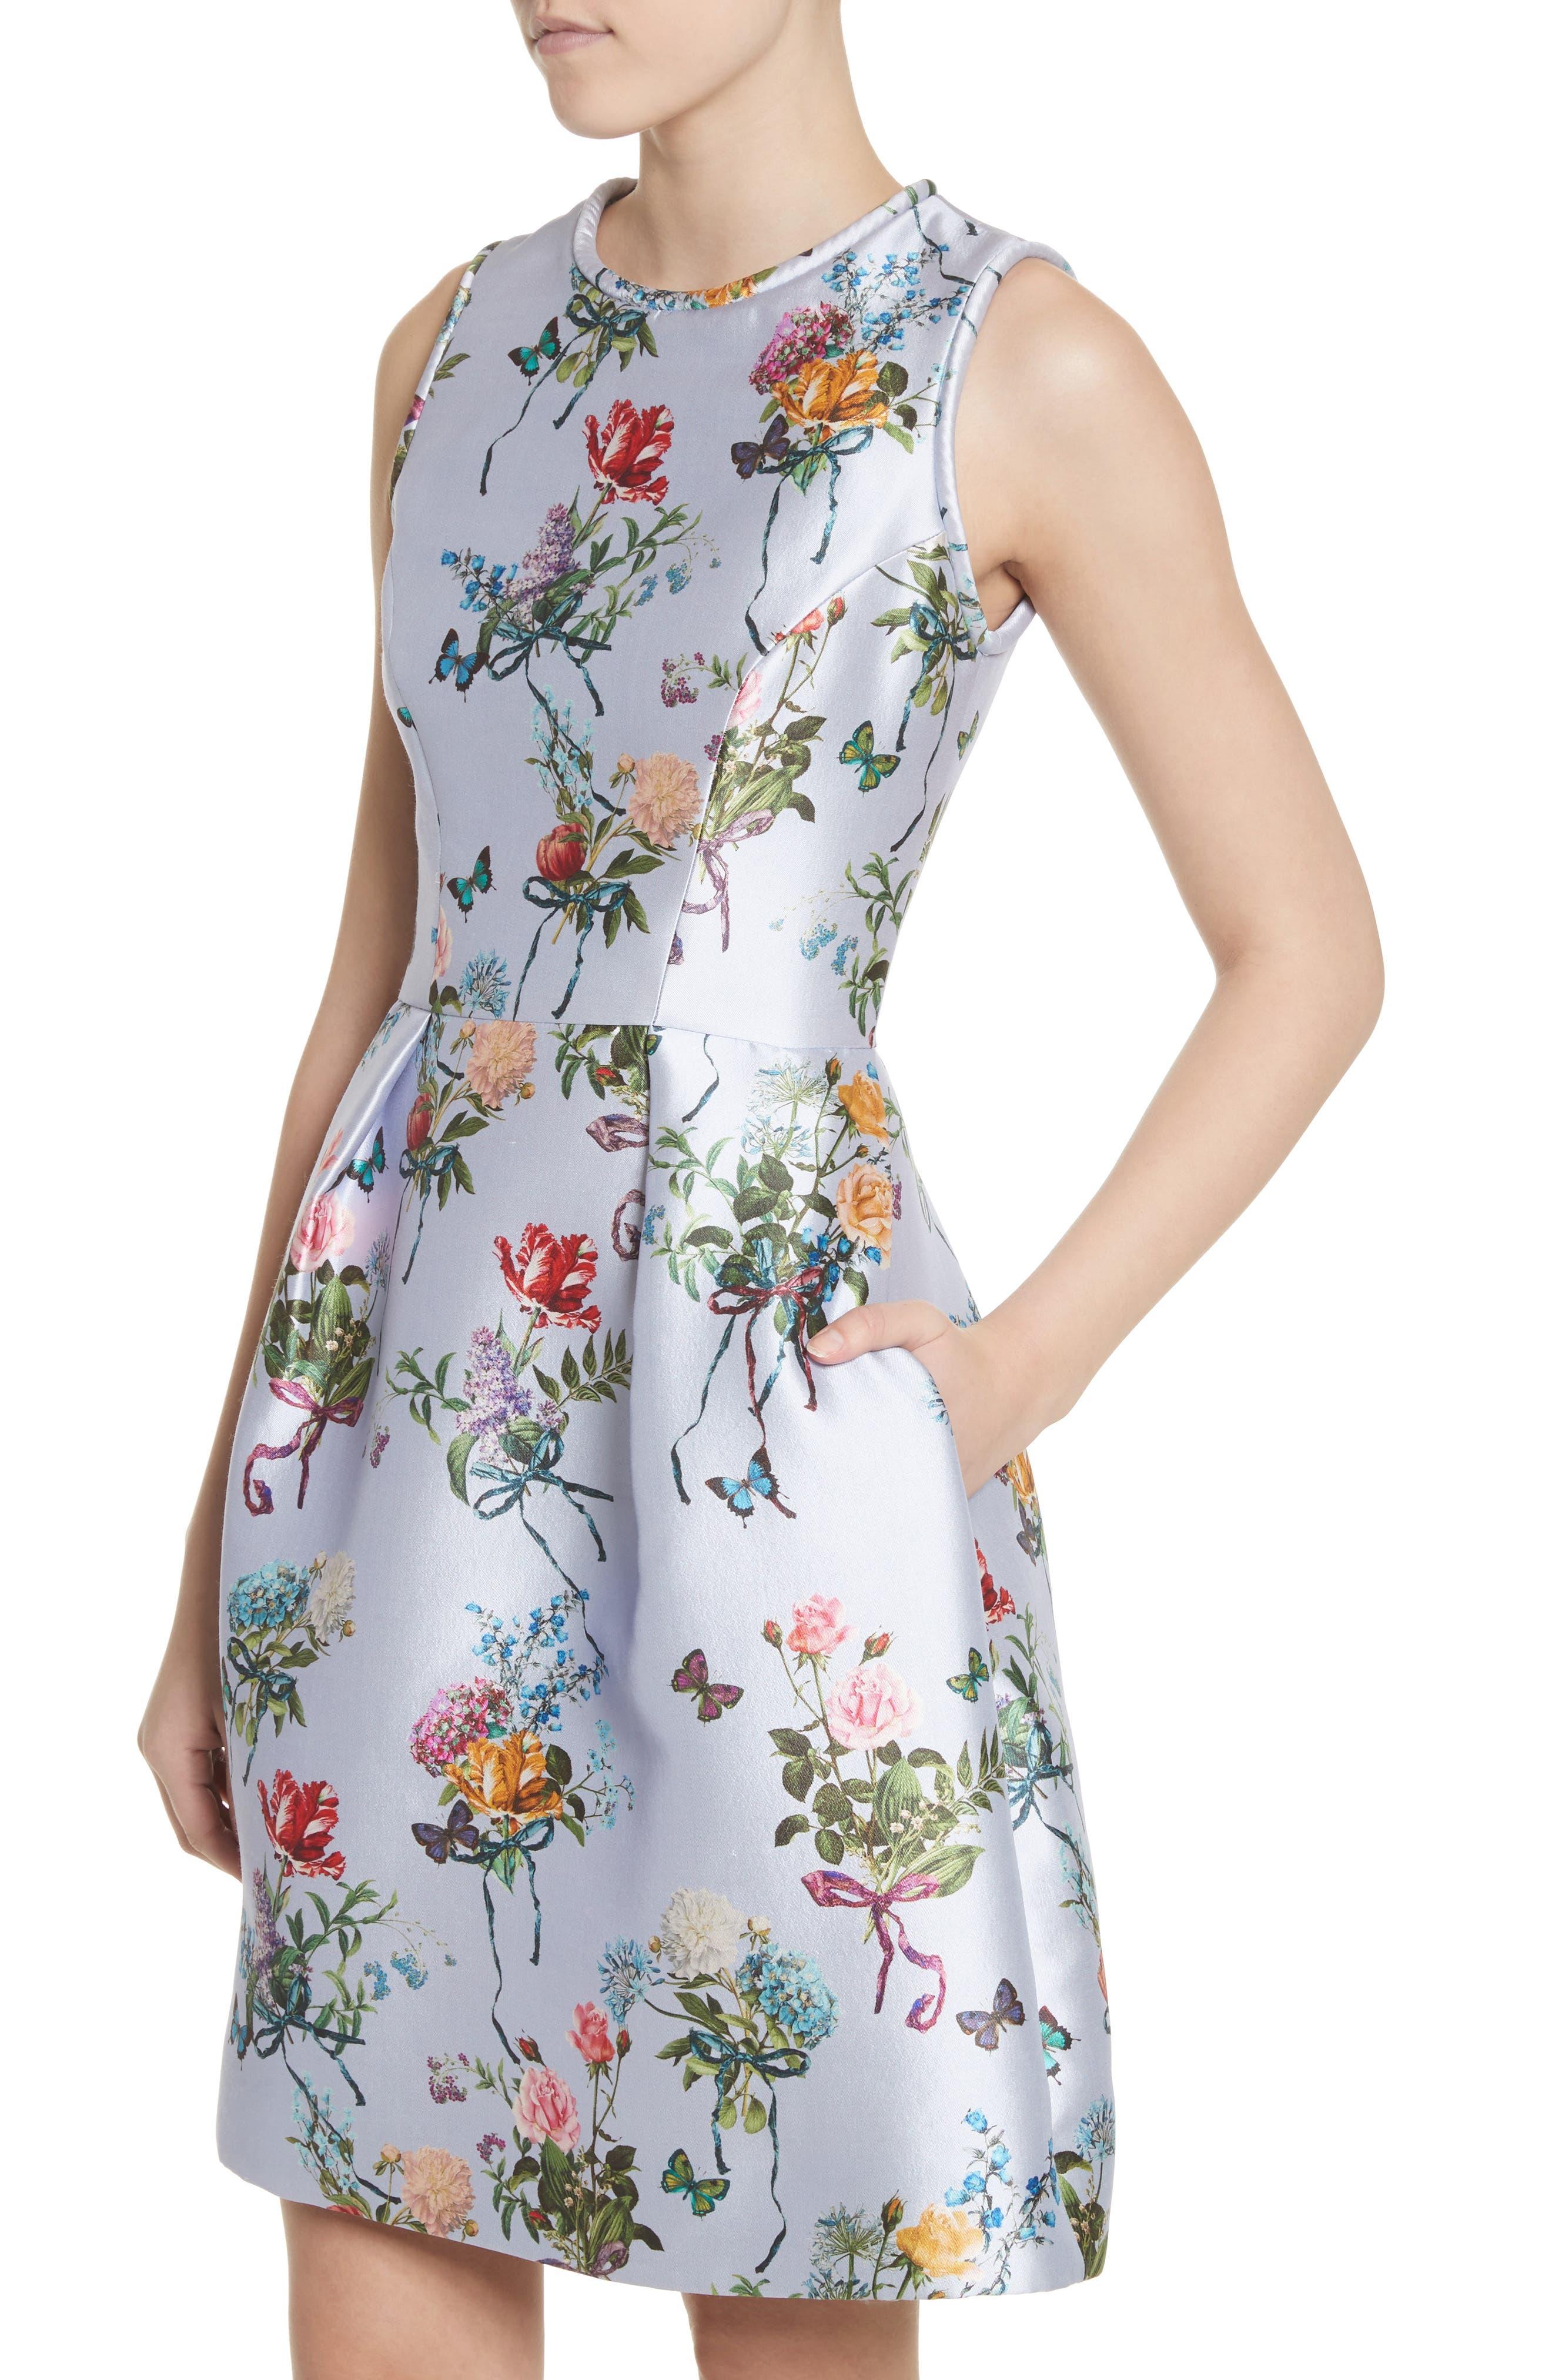 Botantical Print Structured Twill Dress,                             Alternate thumbnail 4, color,                             531